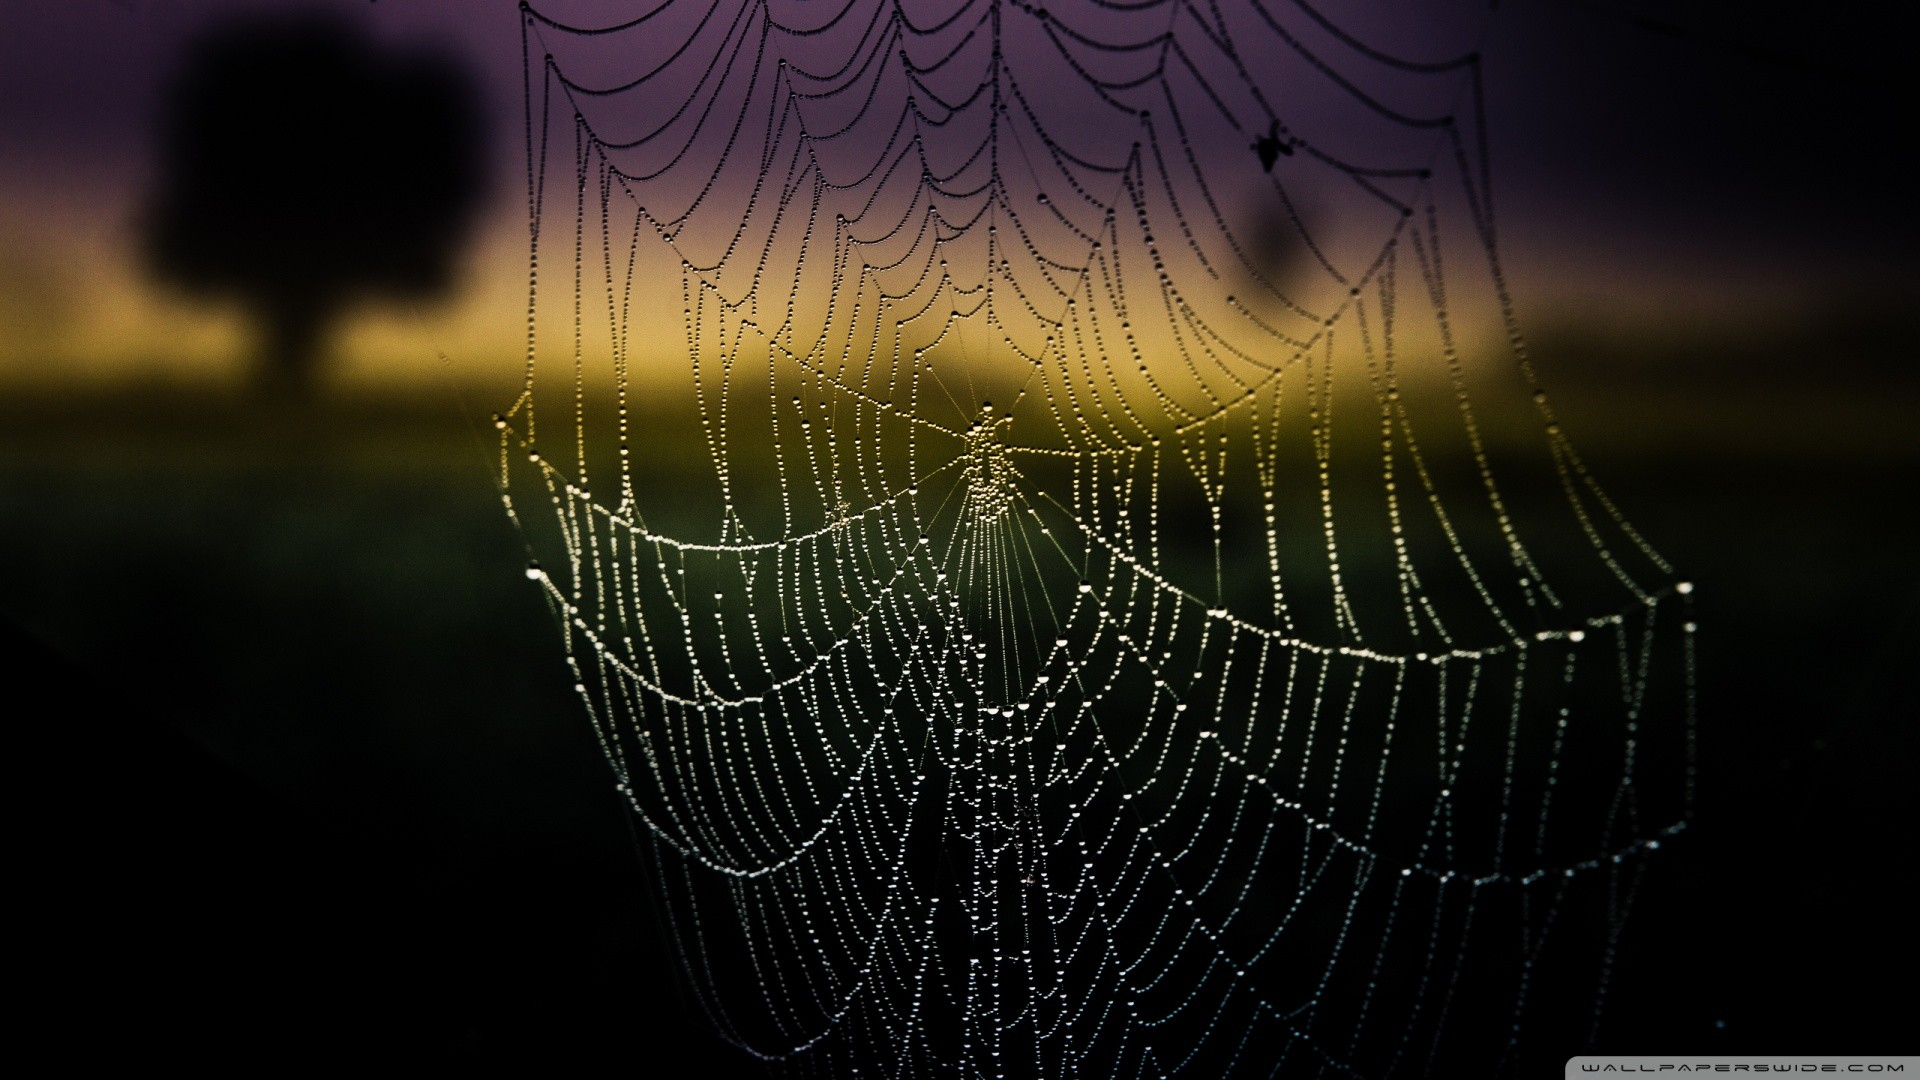 Spider Web Background – Bing images